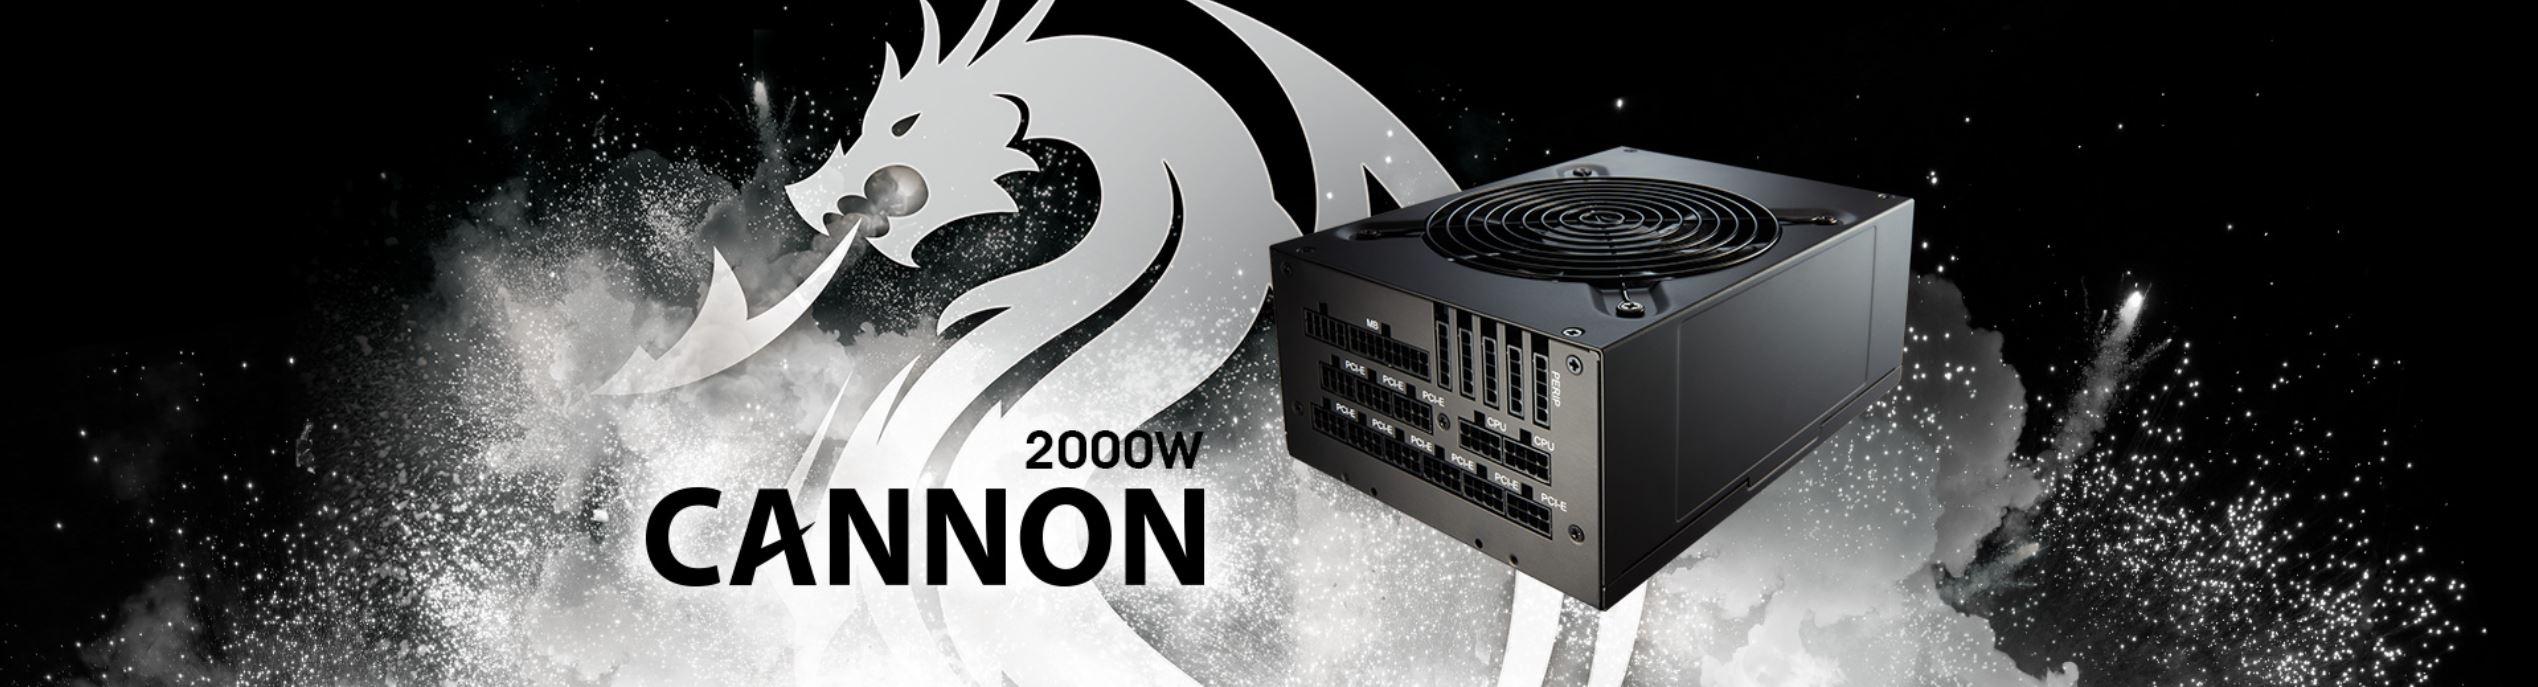 CANNON 2000